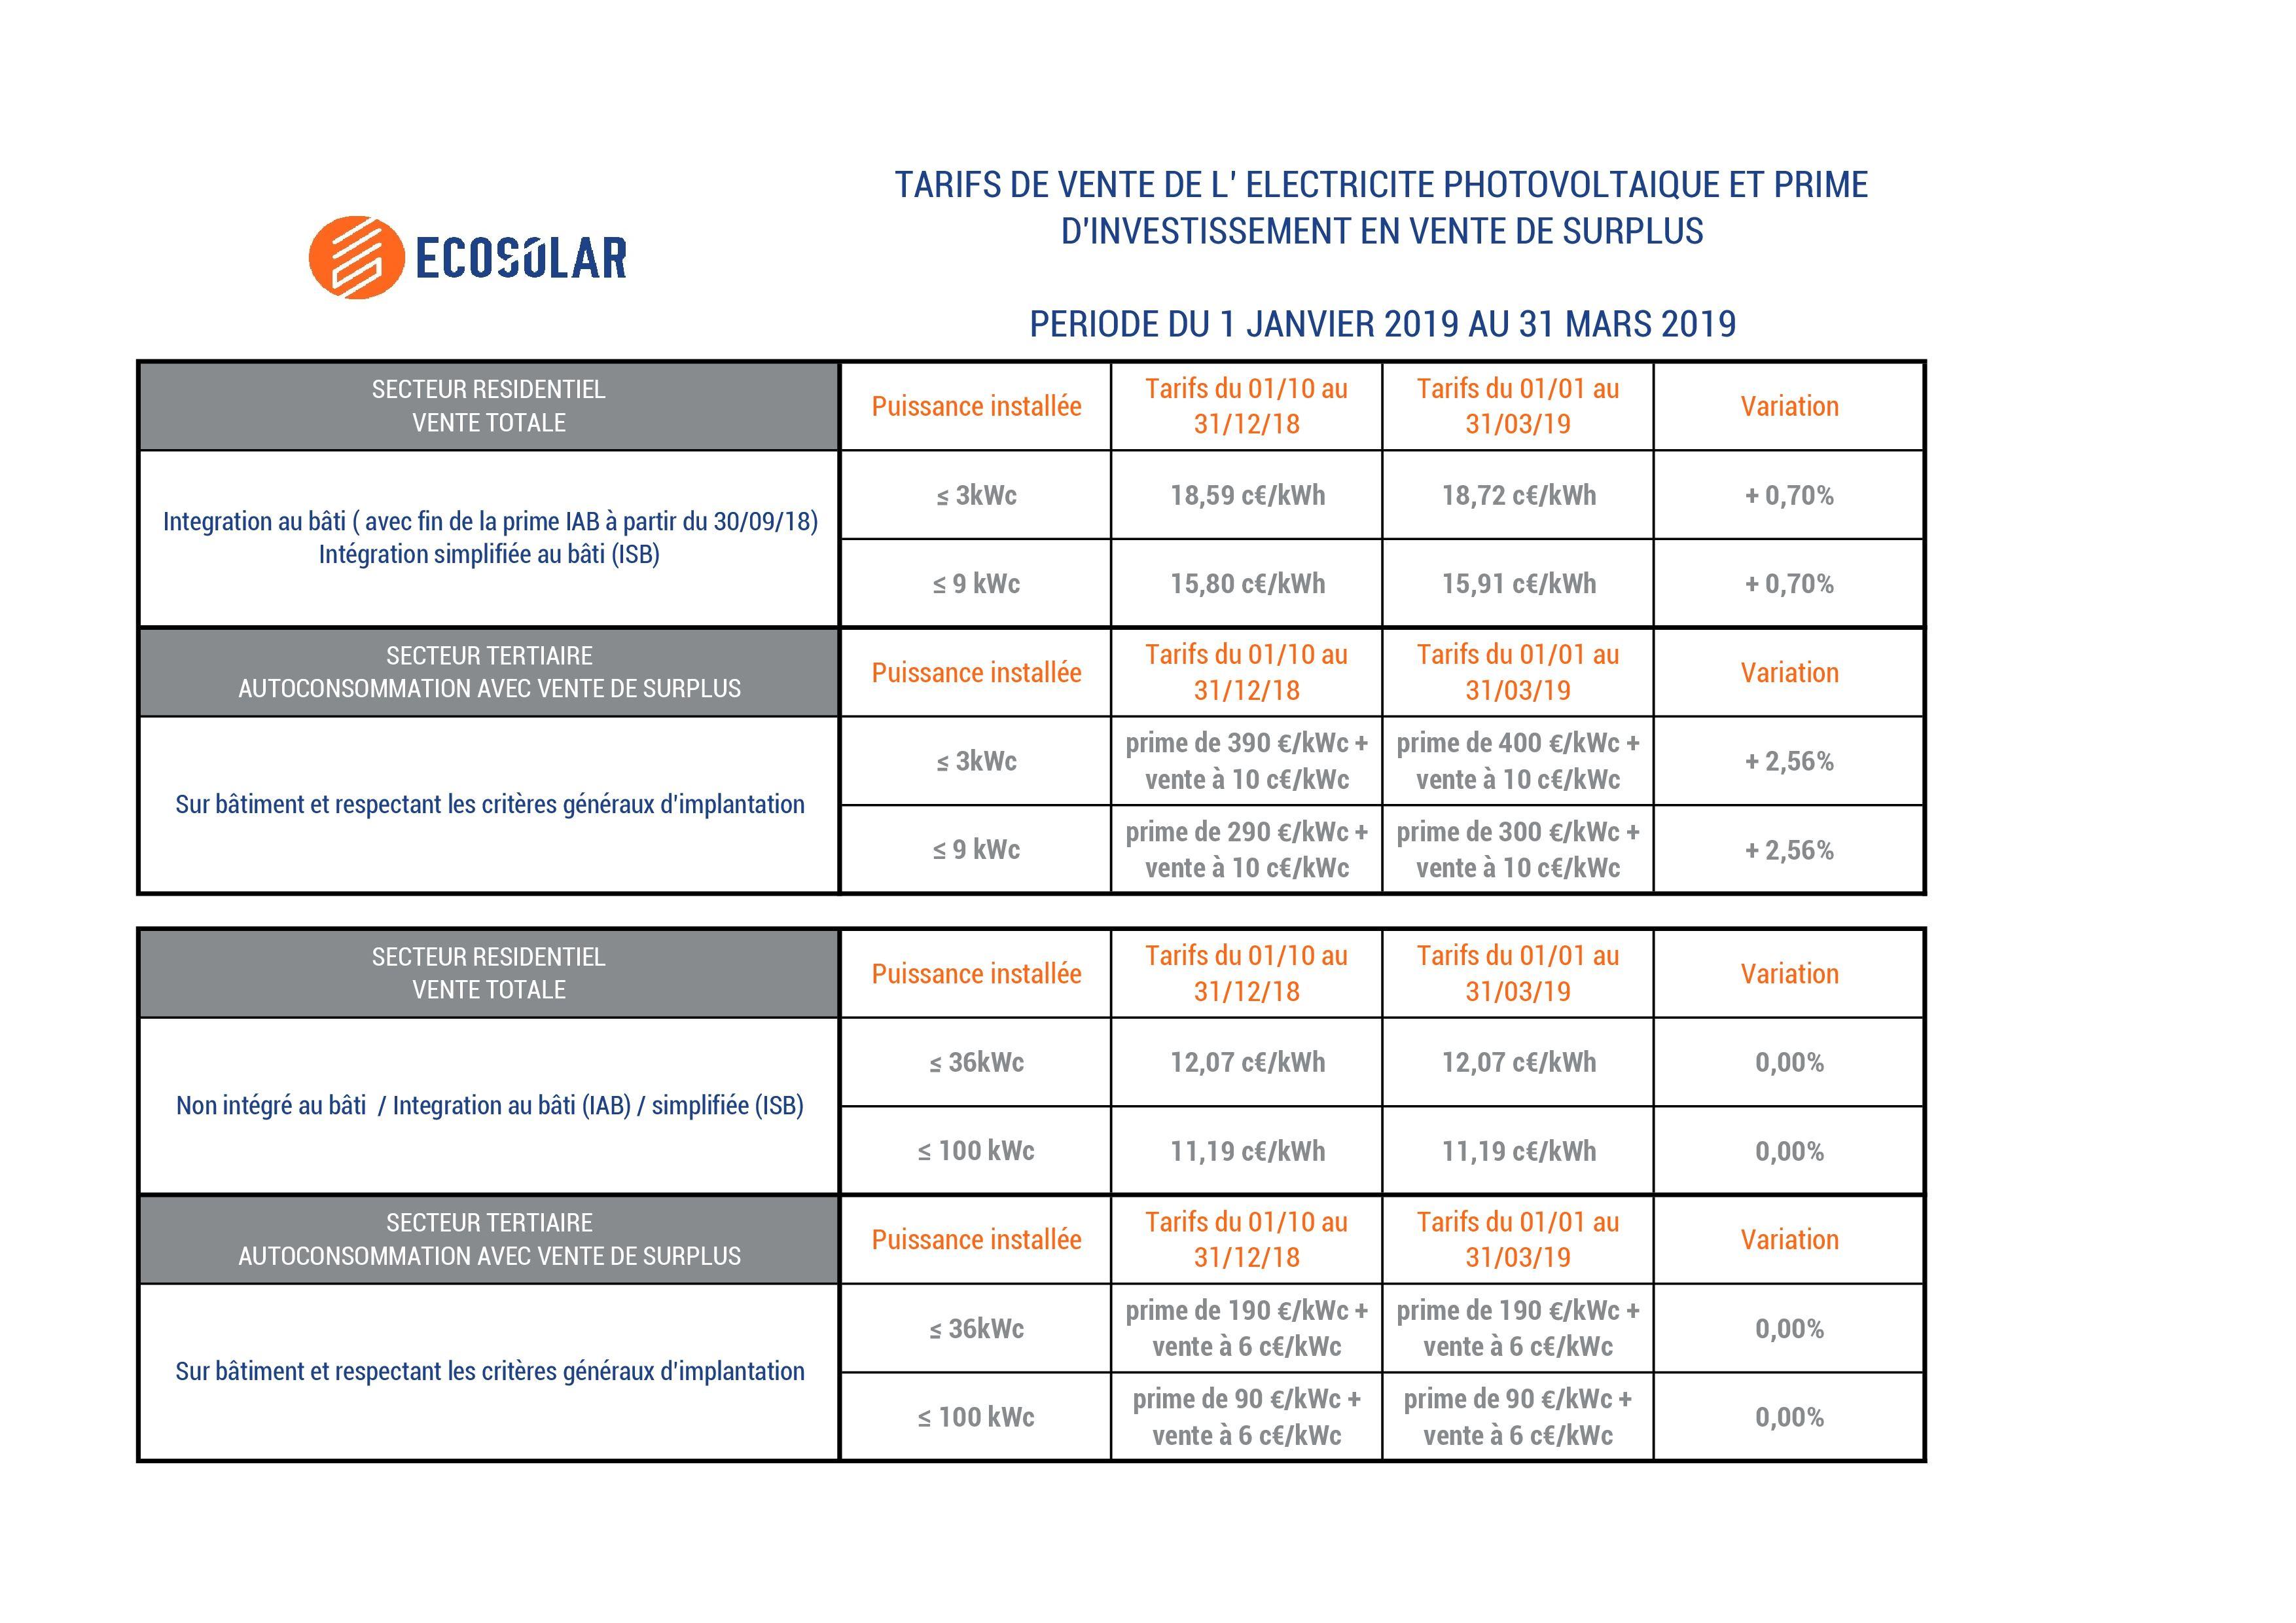 Tarif d'achat photovoltaïque Q1-2019 ECOSOLAR